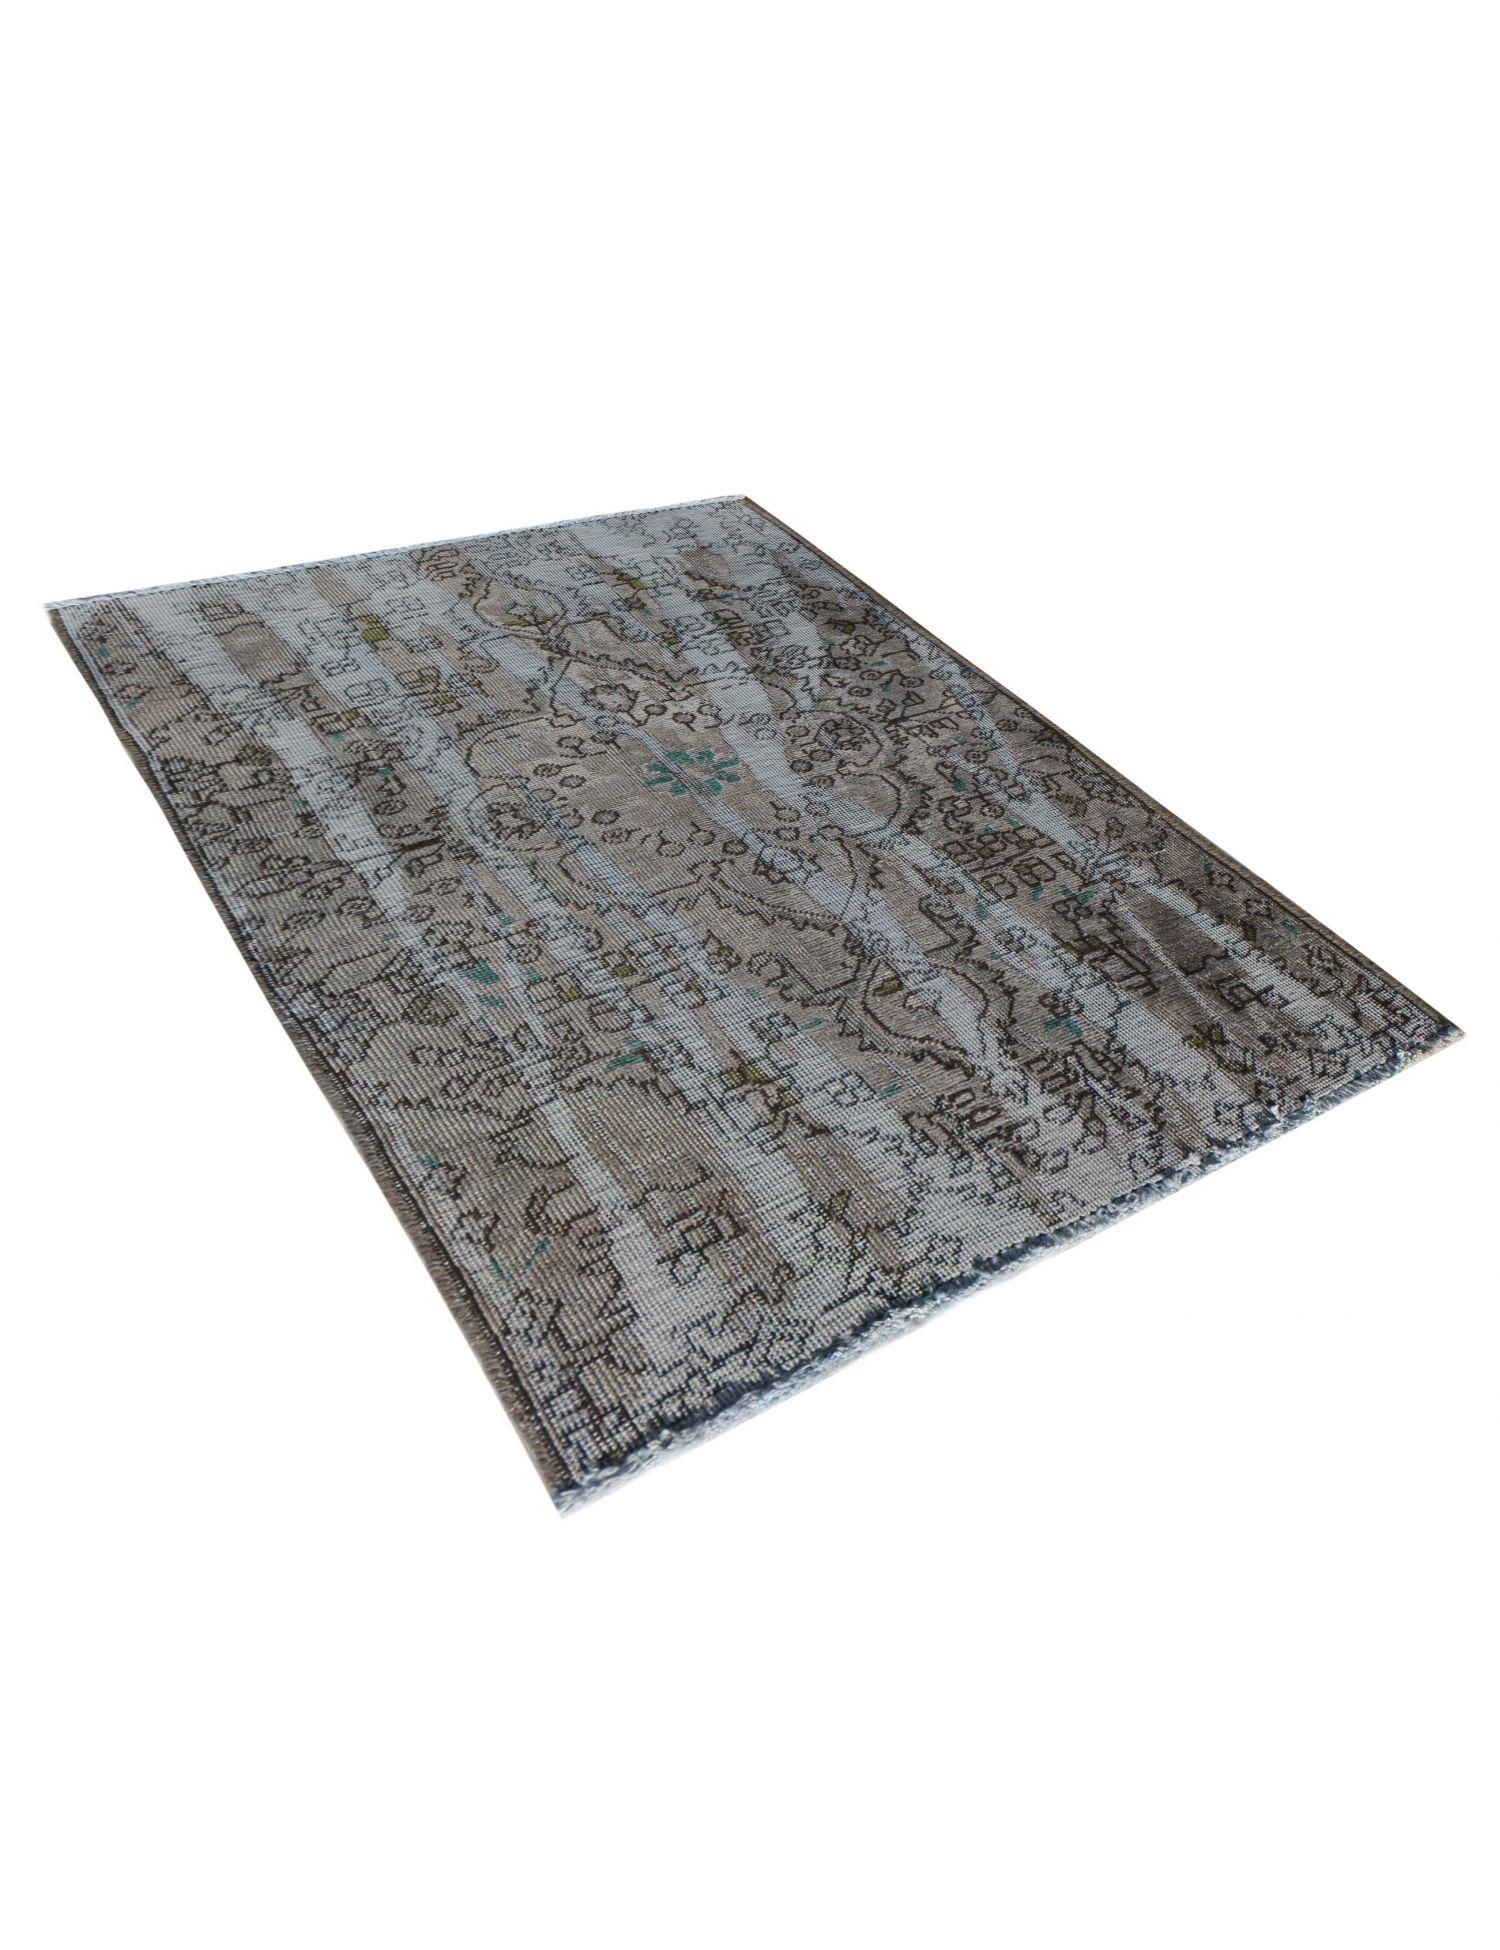 Vintage Perserteppich  grau <br/>130 x 77 cm